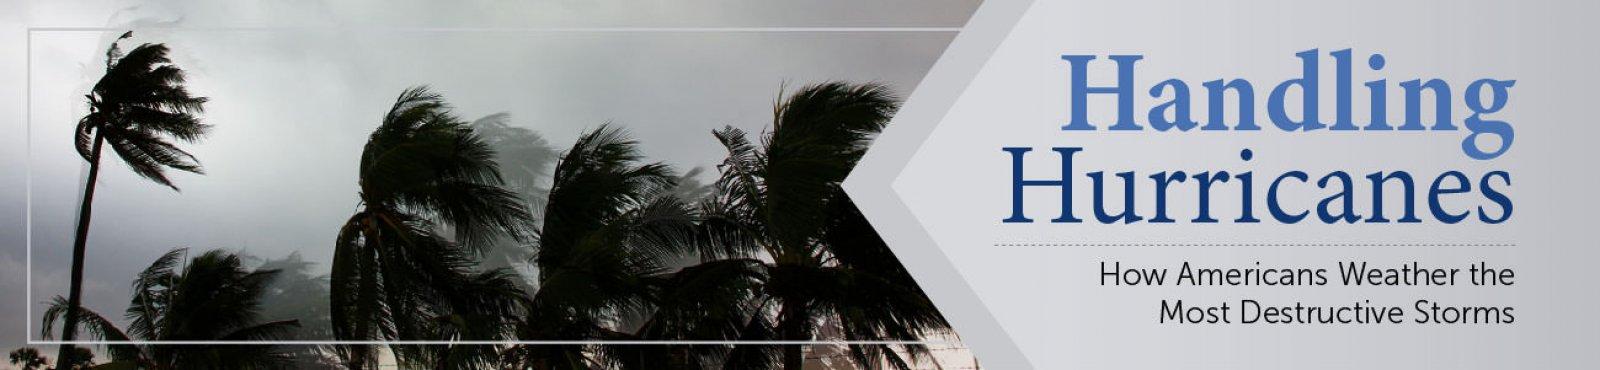 Handling Hurricanes image